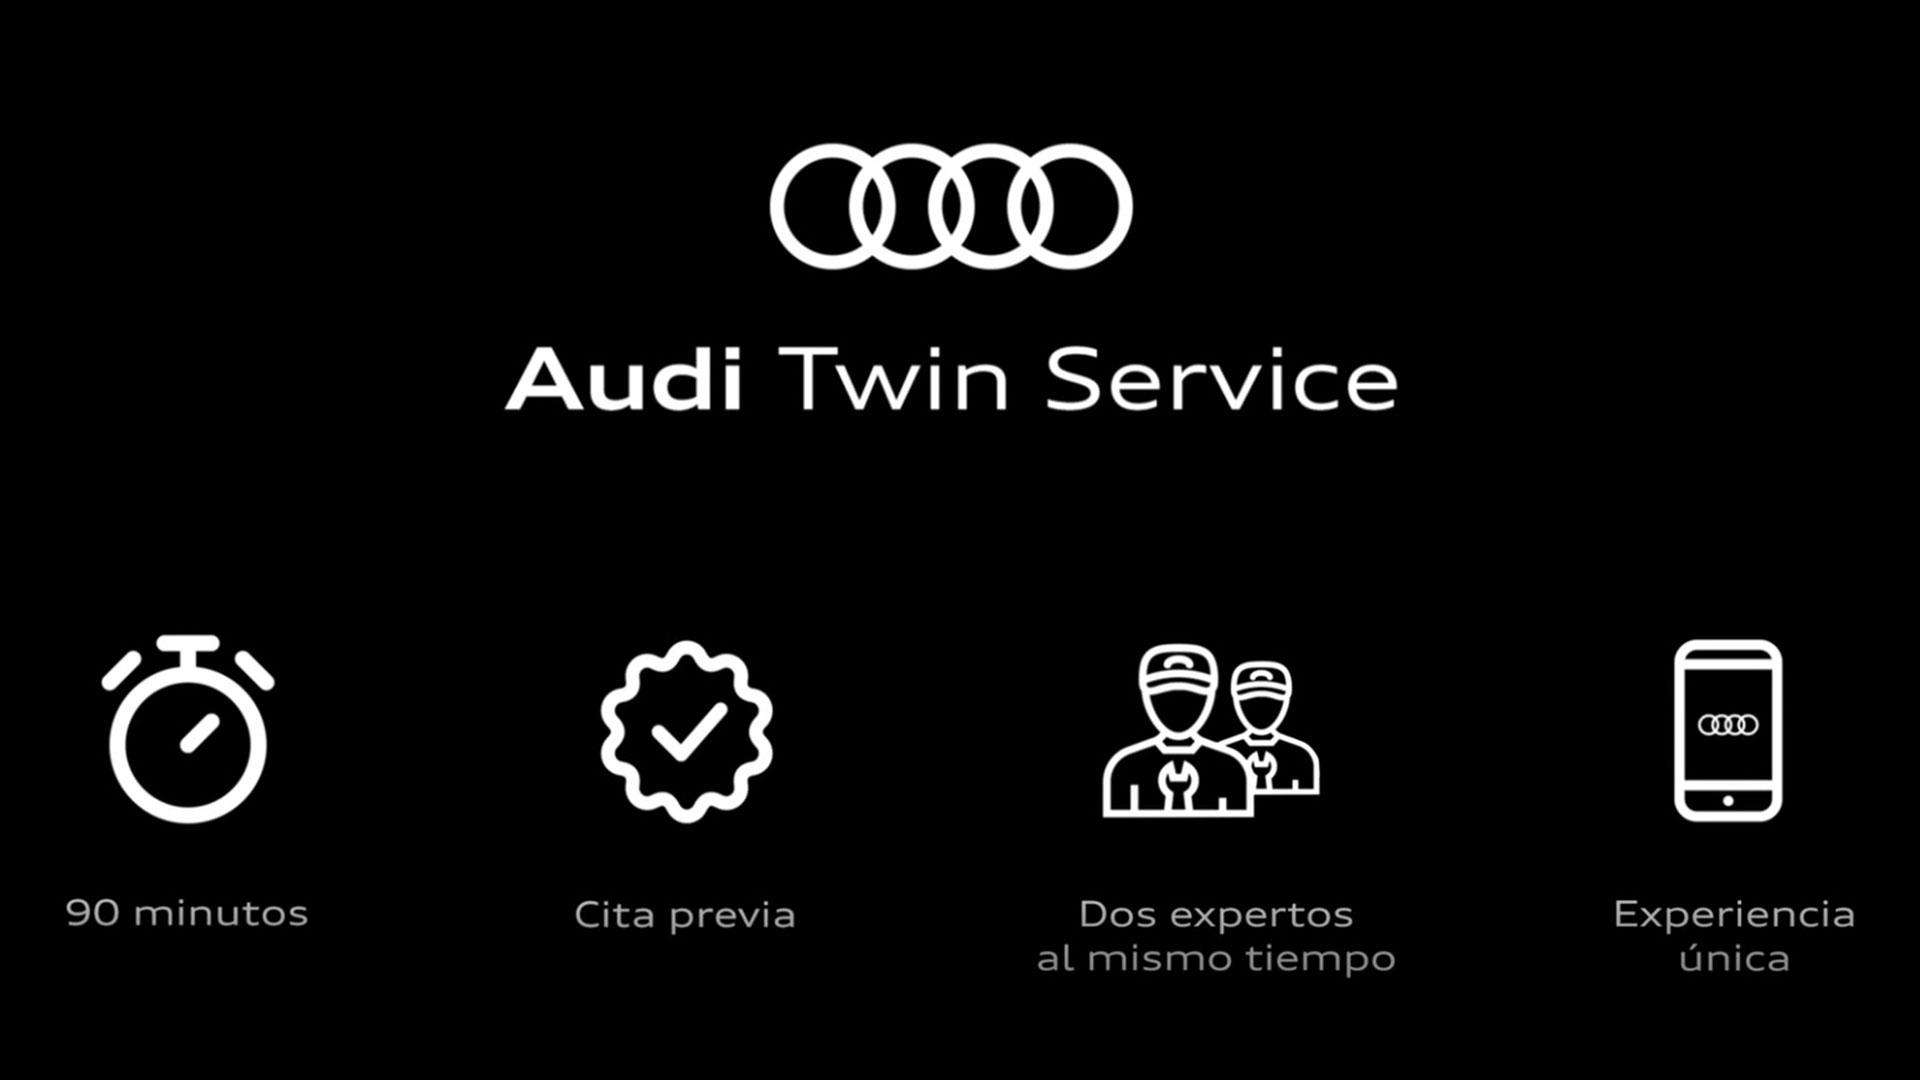 Audi-Twin-Service